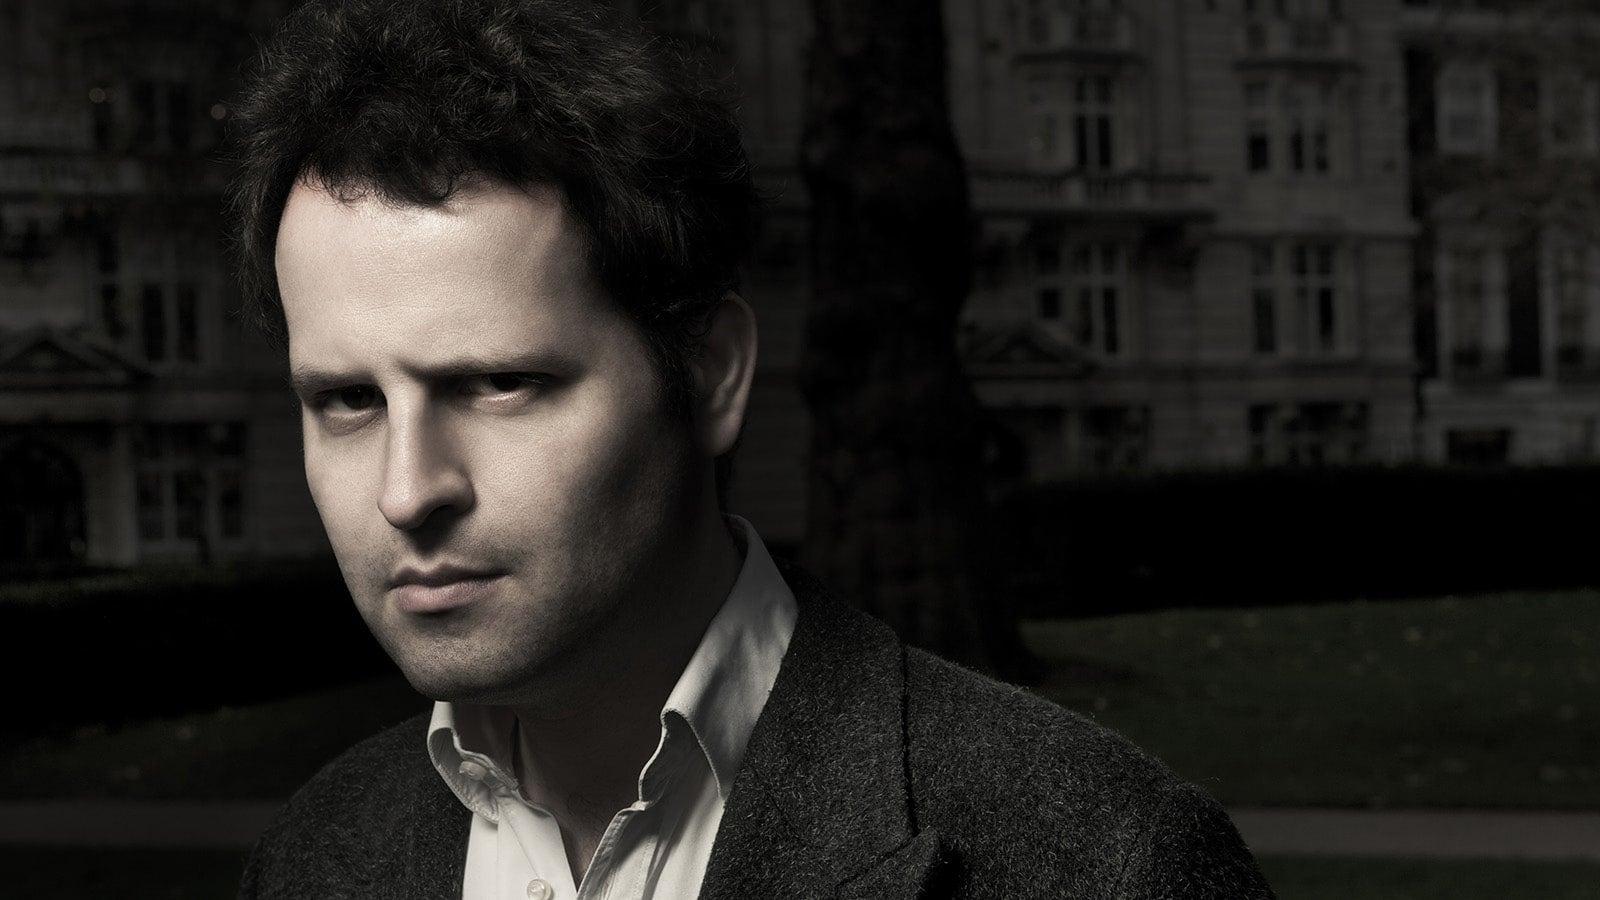 A black and white headshot of Adam Kay